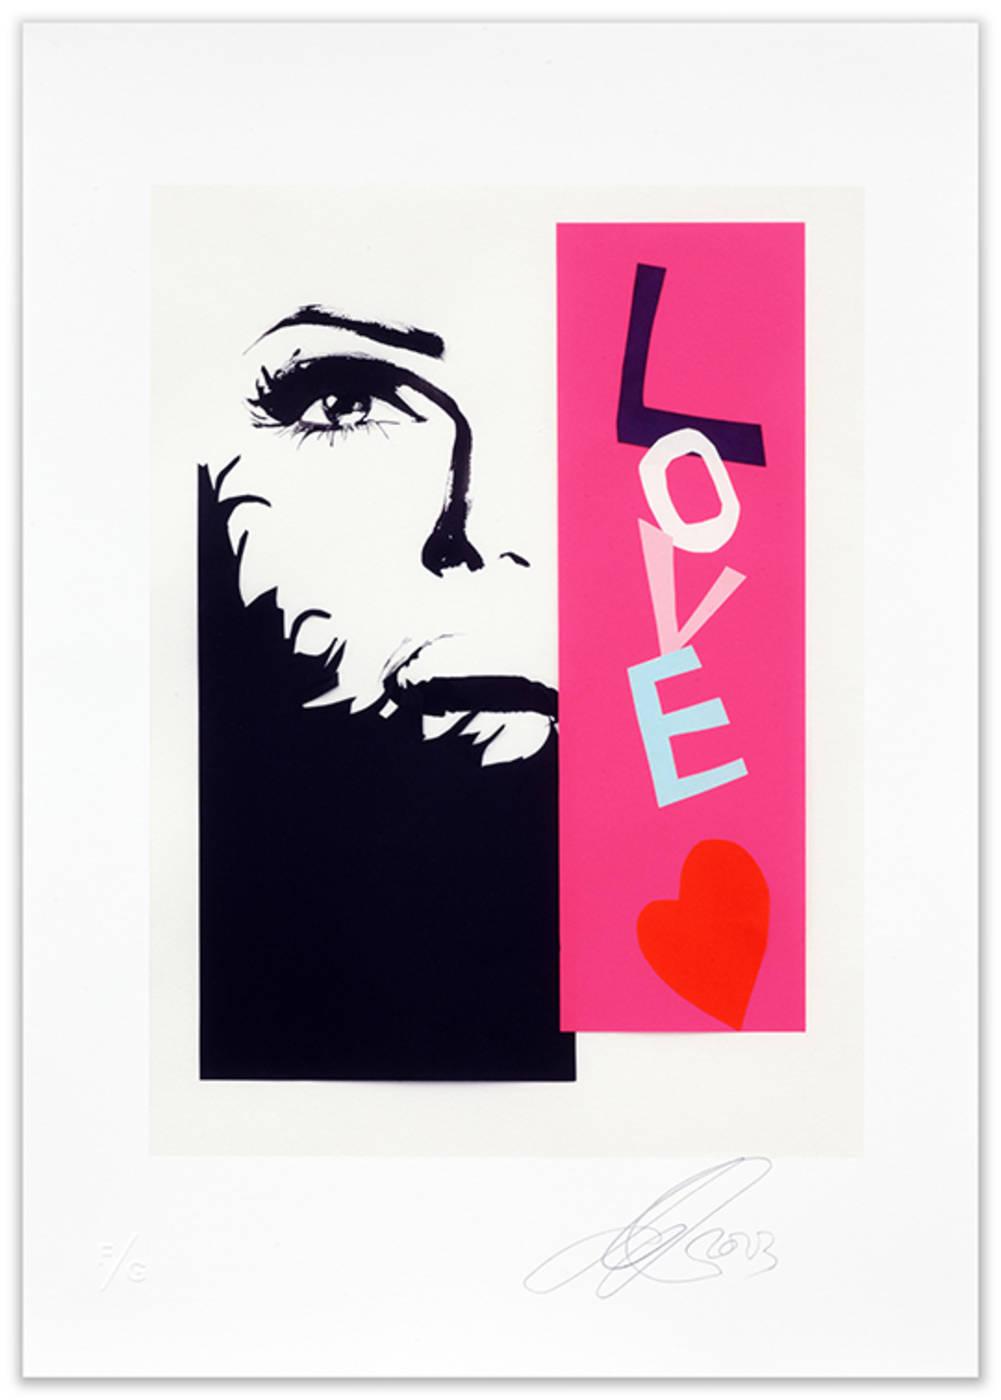 Love YSL